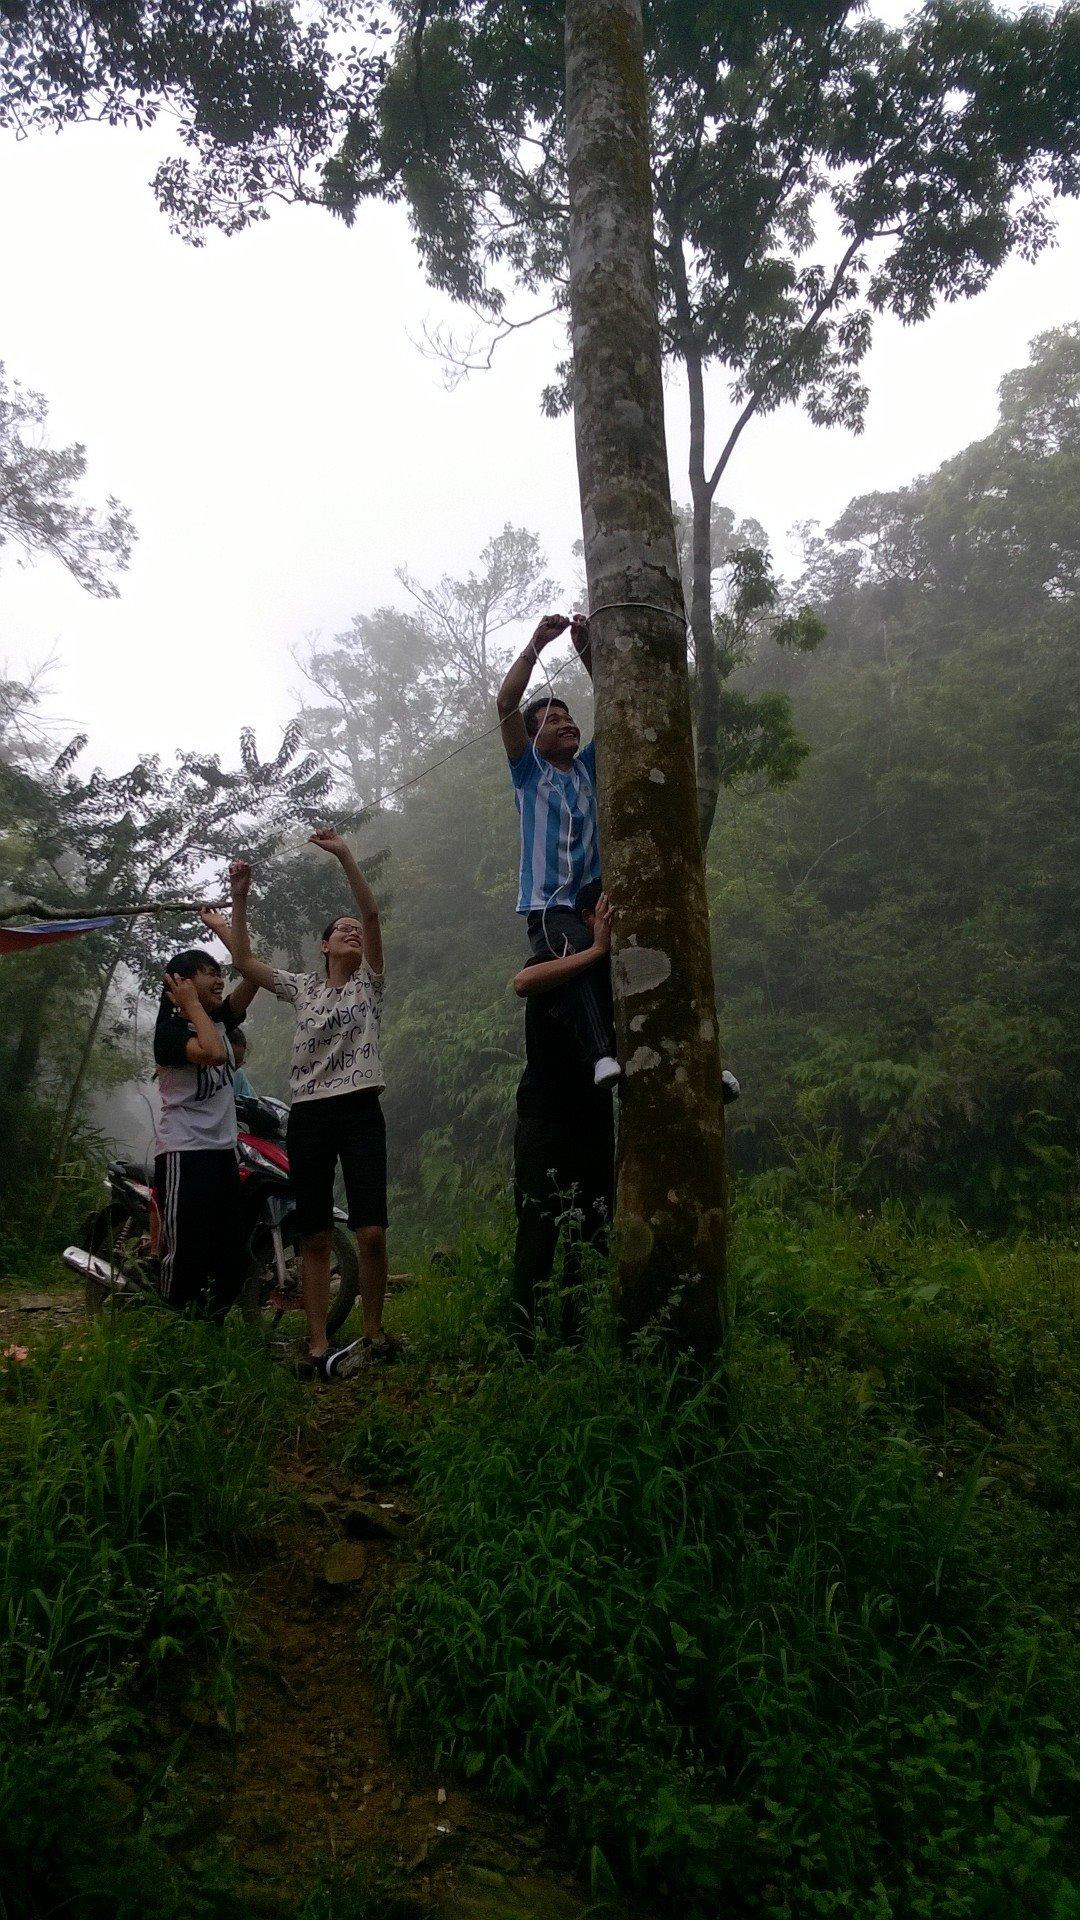 du lịch Tam Đảo tự túc 7